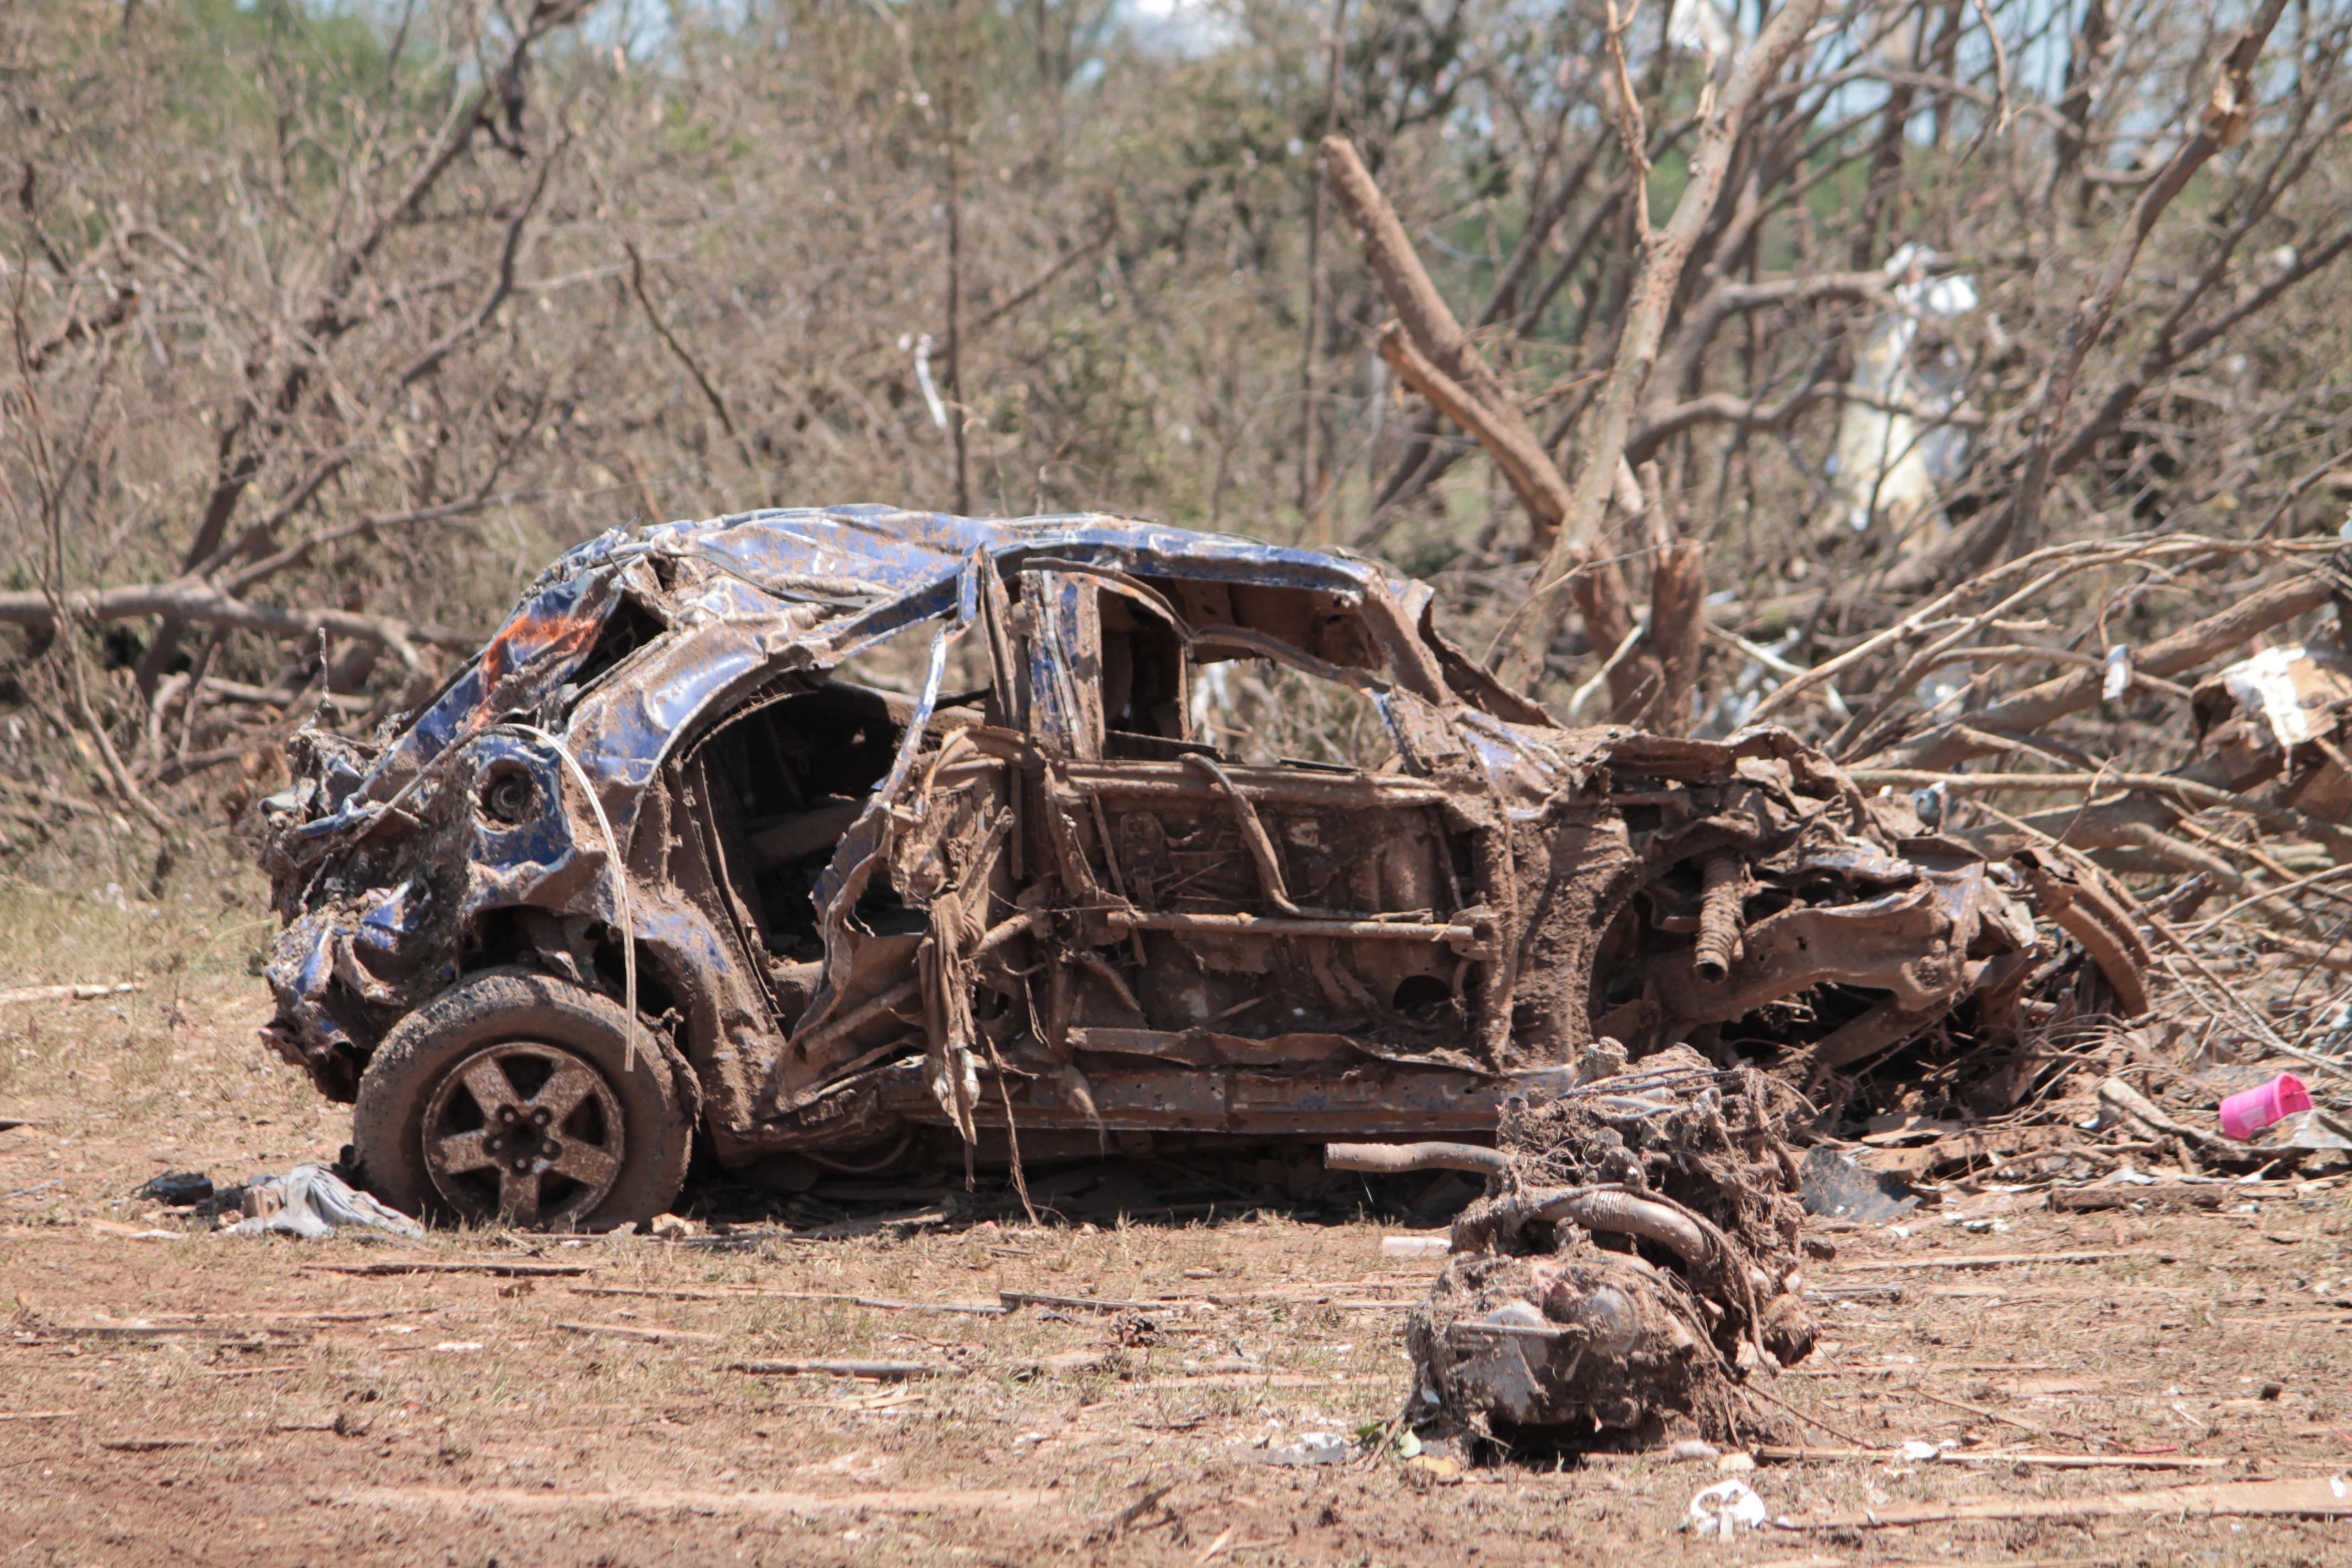 Car Vehicle Mud Soil Ruin Material Destroyed Tornado Natural Disaster Racing Destruction Oklahoma Moore Devastation